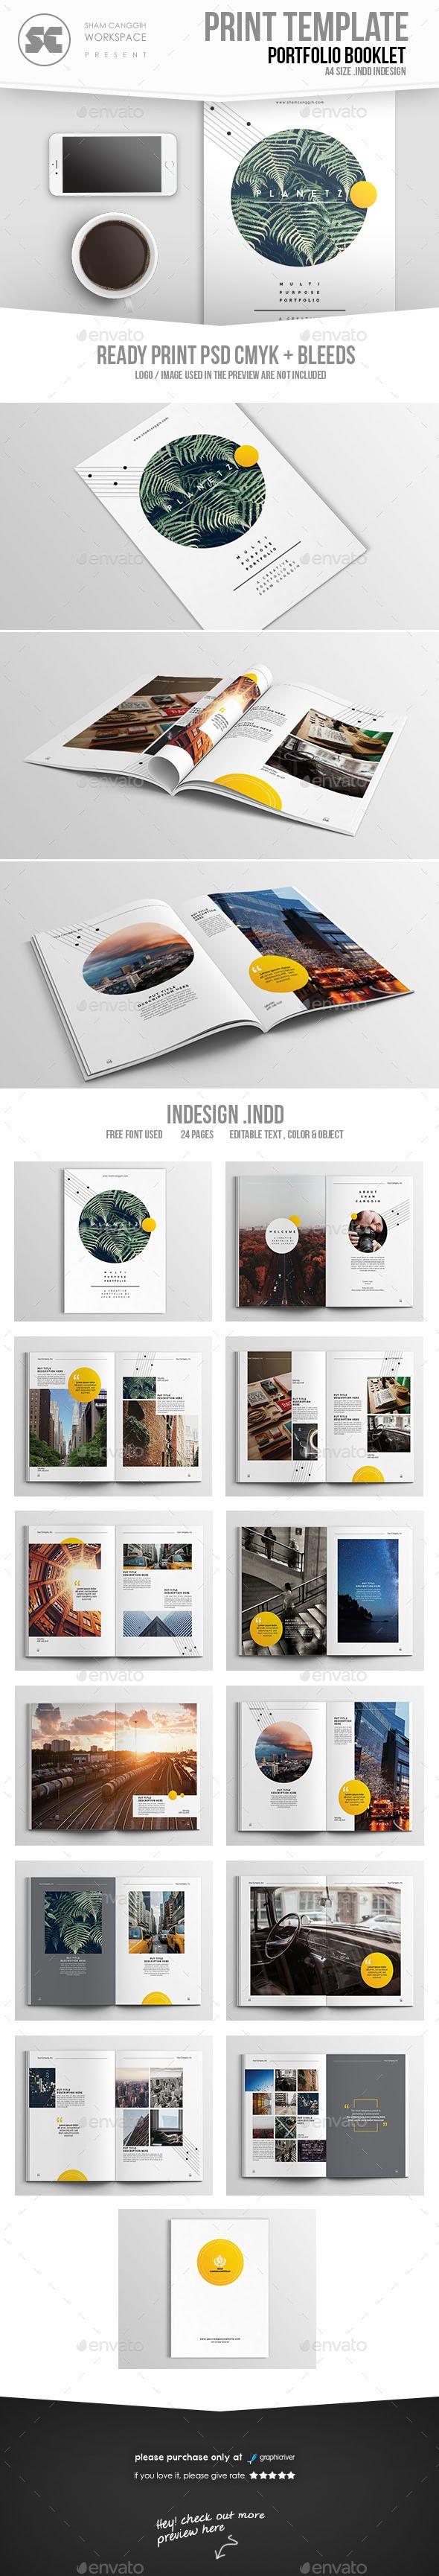 Multipurpose Creative Portfolio Brochure Template InDesign INDD. Download here: https://graphicriver.net/item/multipurpose-creative-portfolio/17210058?ref=ksioks